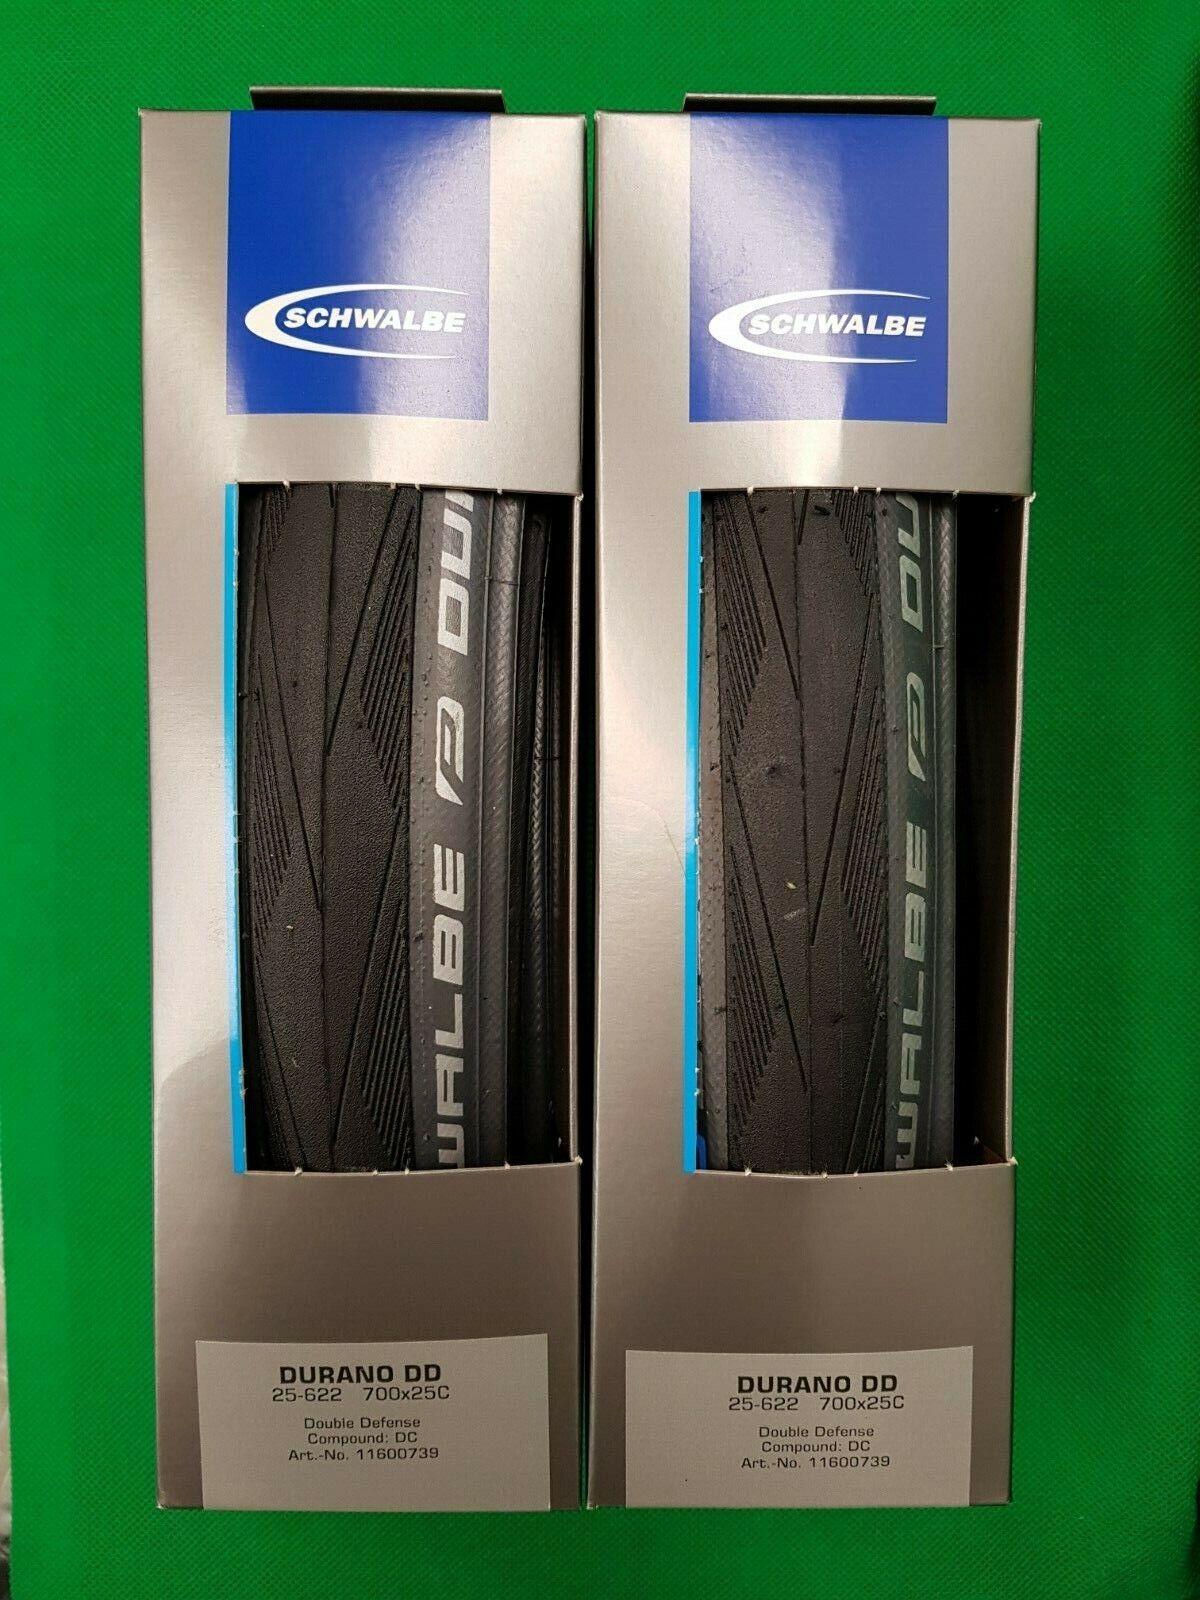 Schwalbe Durano DD 700x25c  Folding Tyres (x2)  fitness retailer